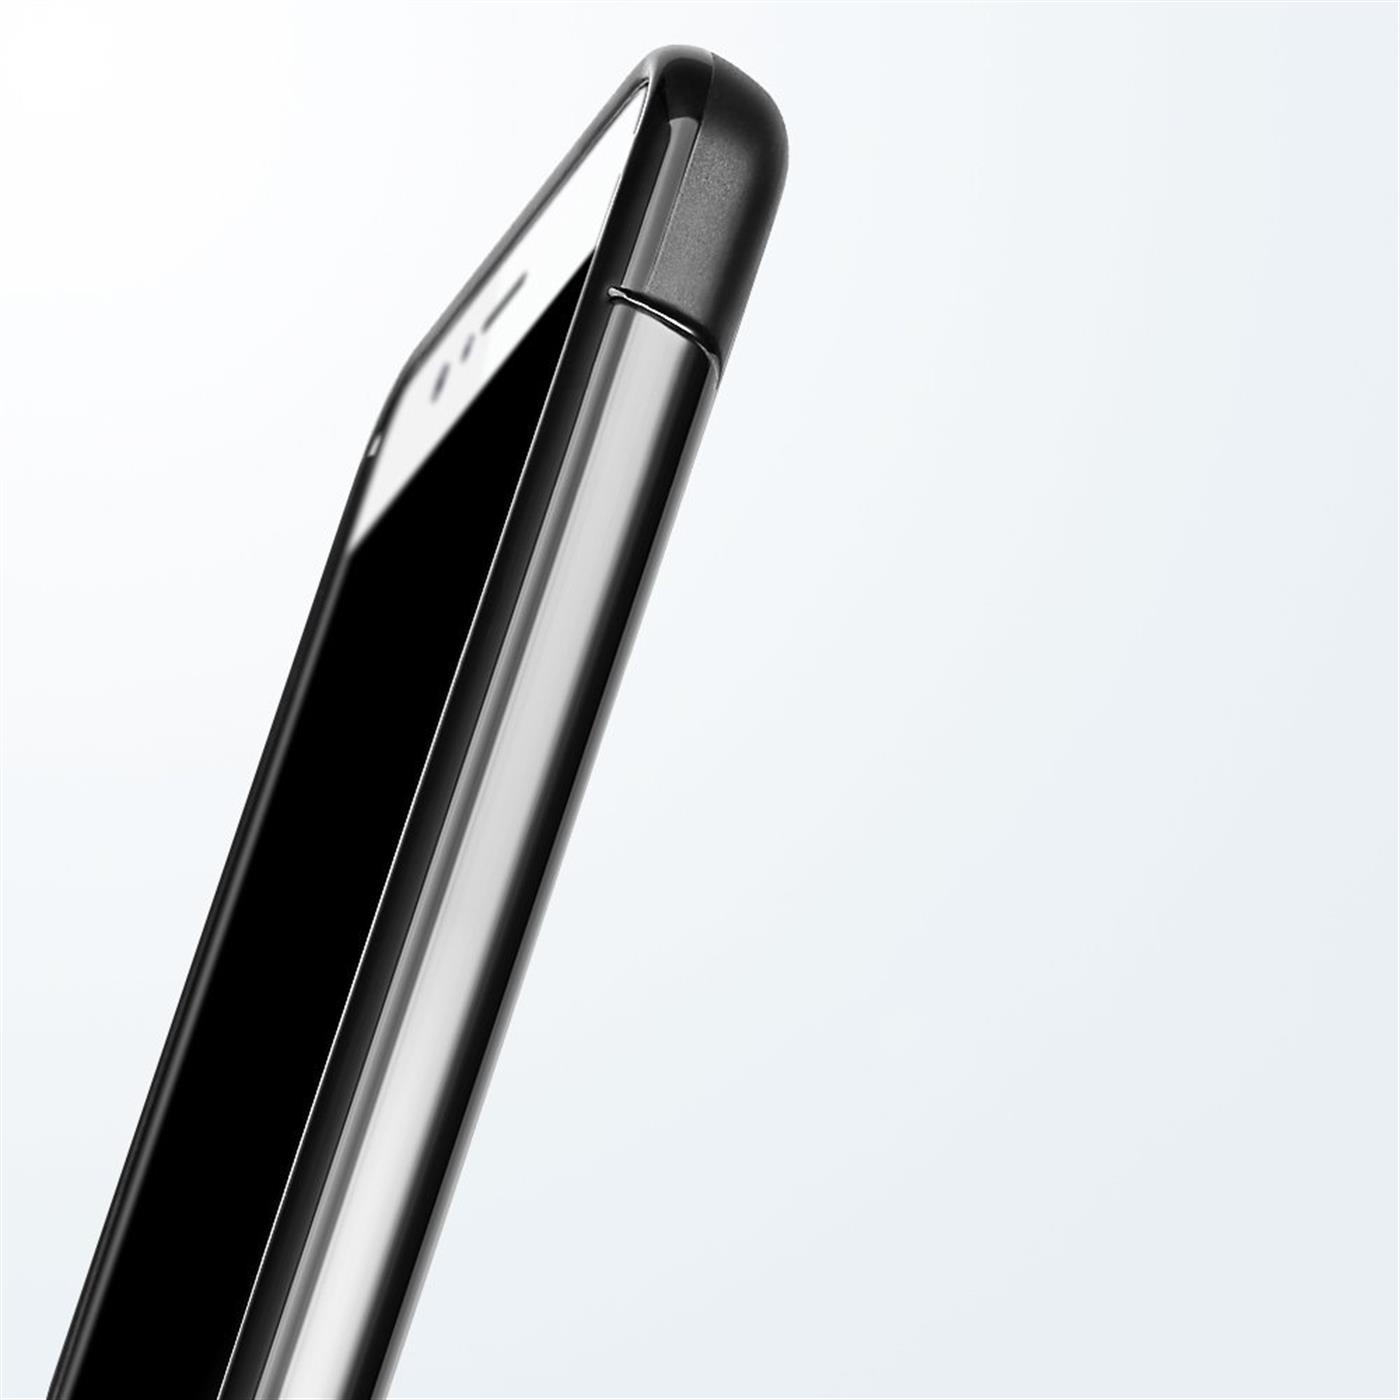 Samsung-Galaxy-j7-2016-Silikon-Gel-S-Line-Case-Cover-Duenn-Slim-Back-Bumper Indexbild 22